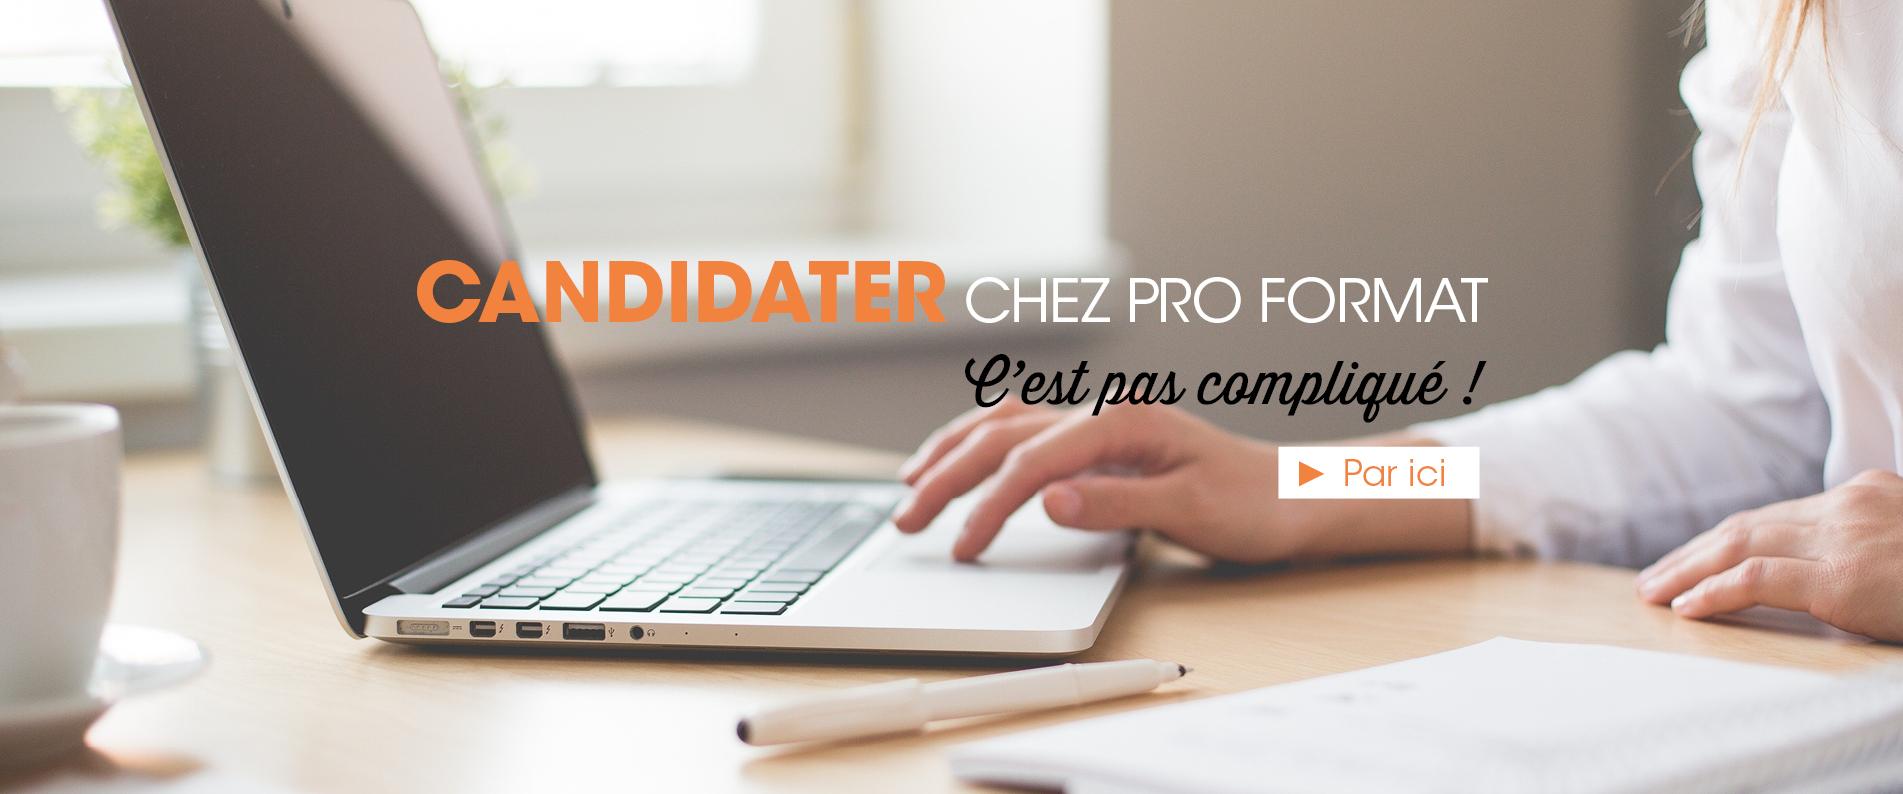 candidater chez Pro Format alternance mulhouse